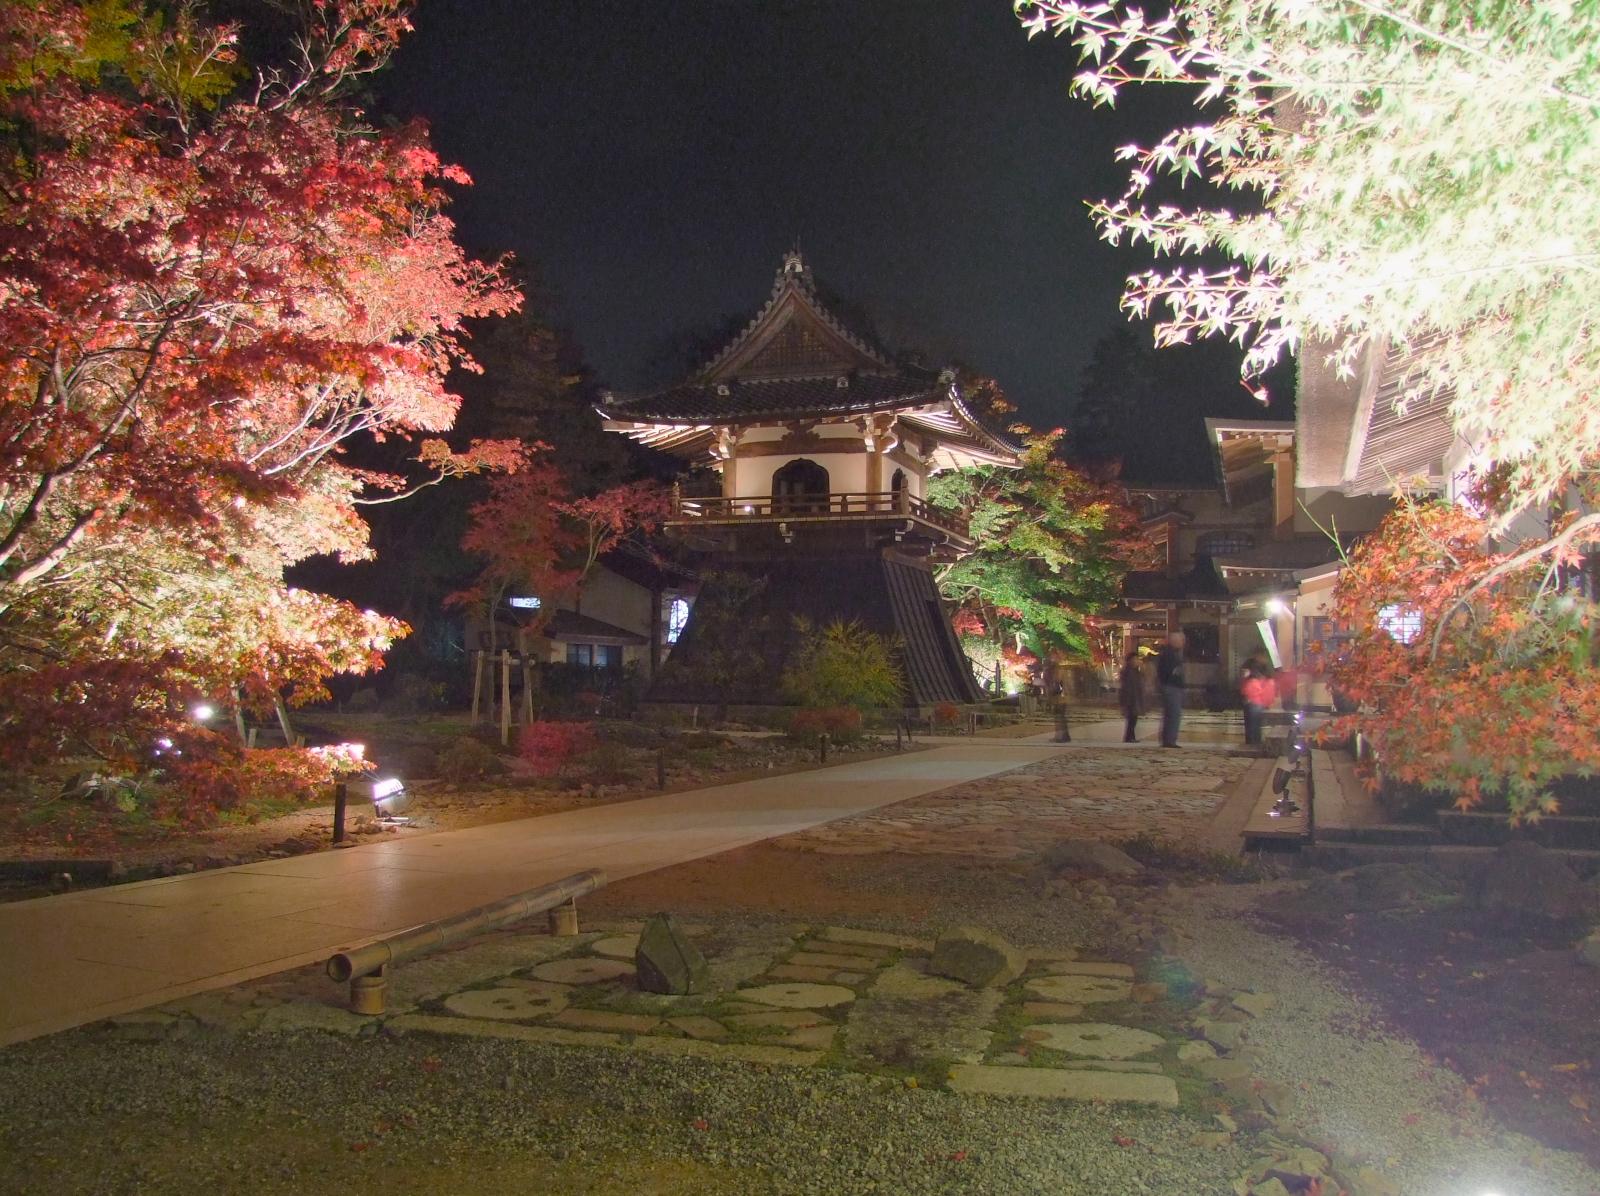 http://www.eigenji-t.jp/admission/images/DSCF2156.jpg